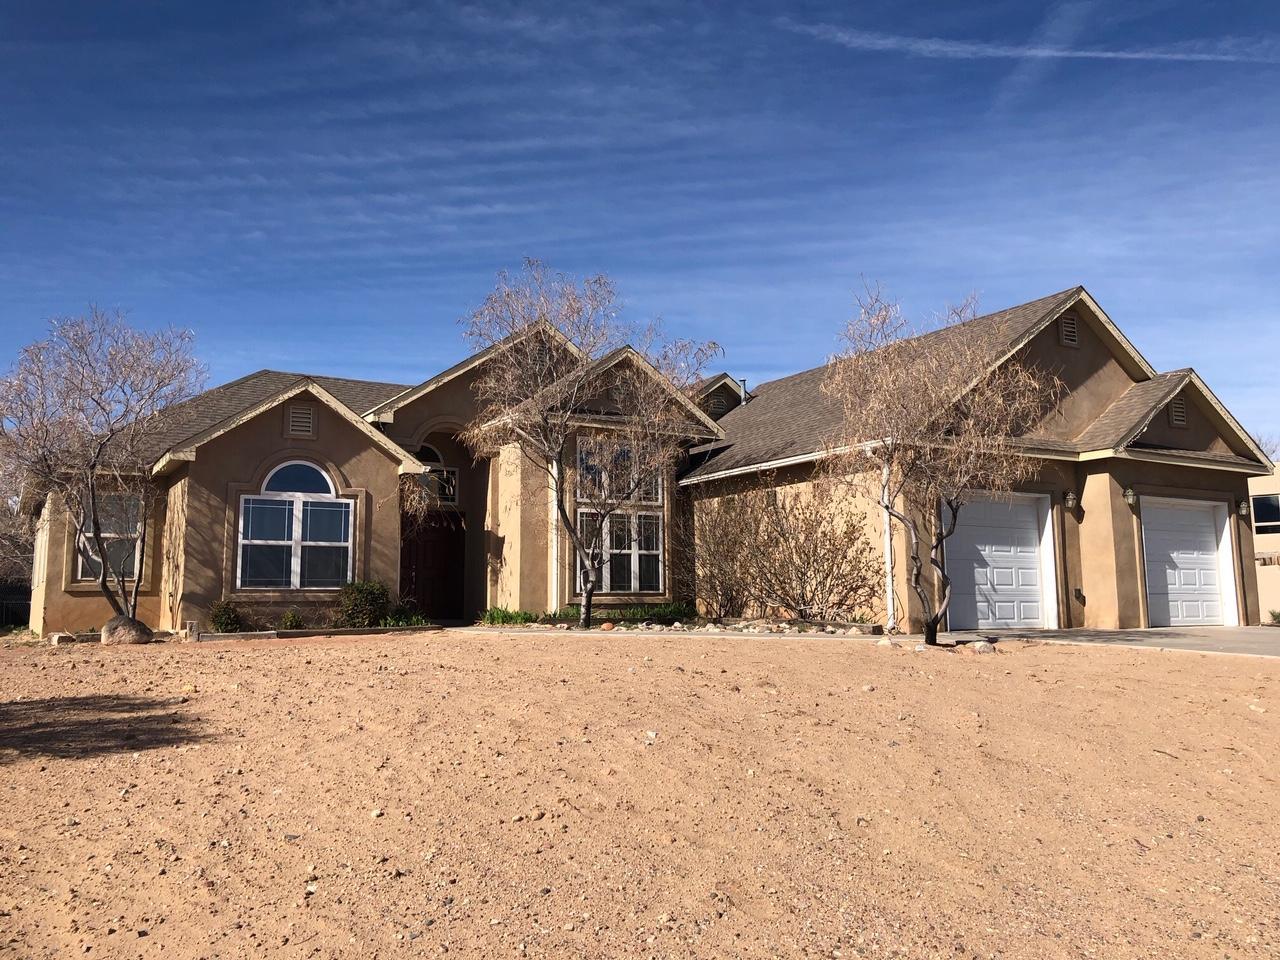 5516 NE Vera Cruz Road, Rio Rancho in Sandoval County, NM 87144 Home for Sale